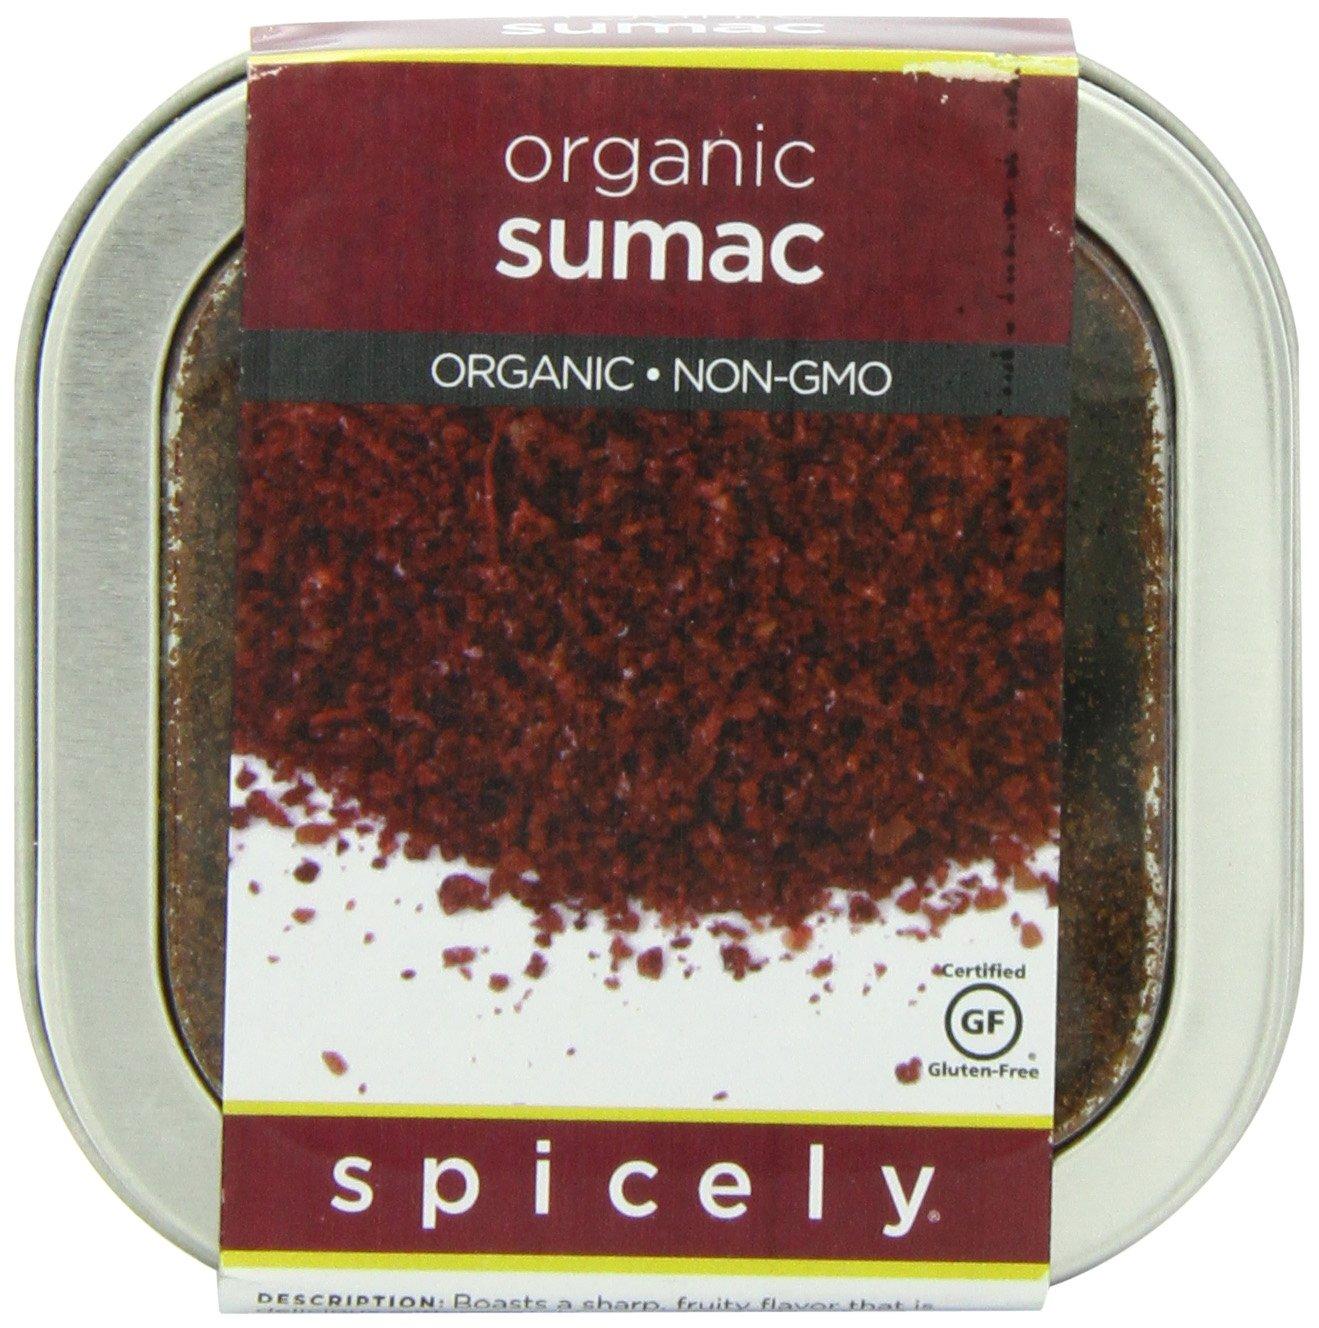 Spicely Organic Sumac - Tin